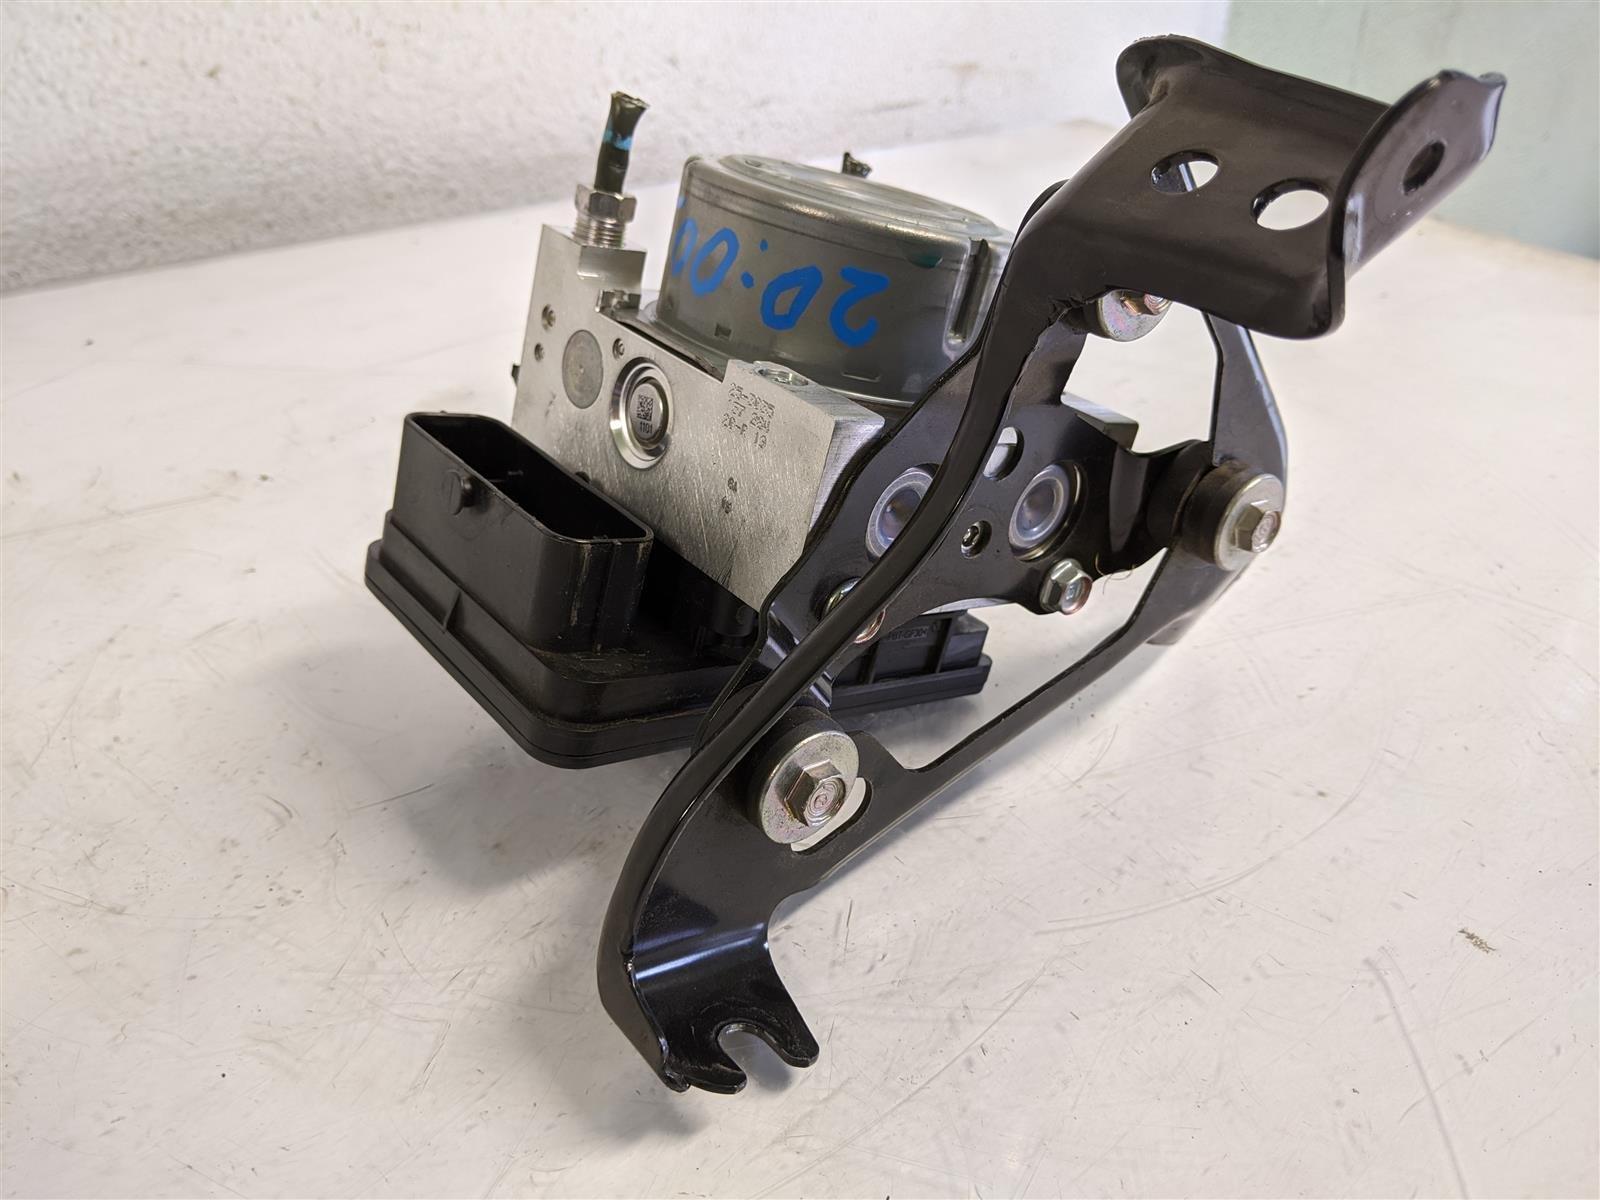 2016 Honda Pilot 2wd Abs Vsa Pump Replacement